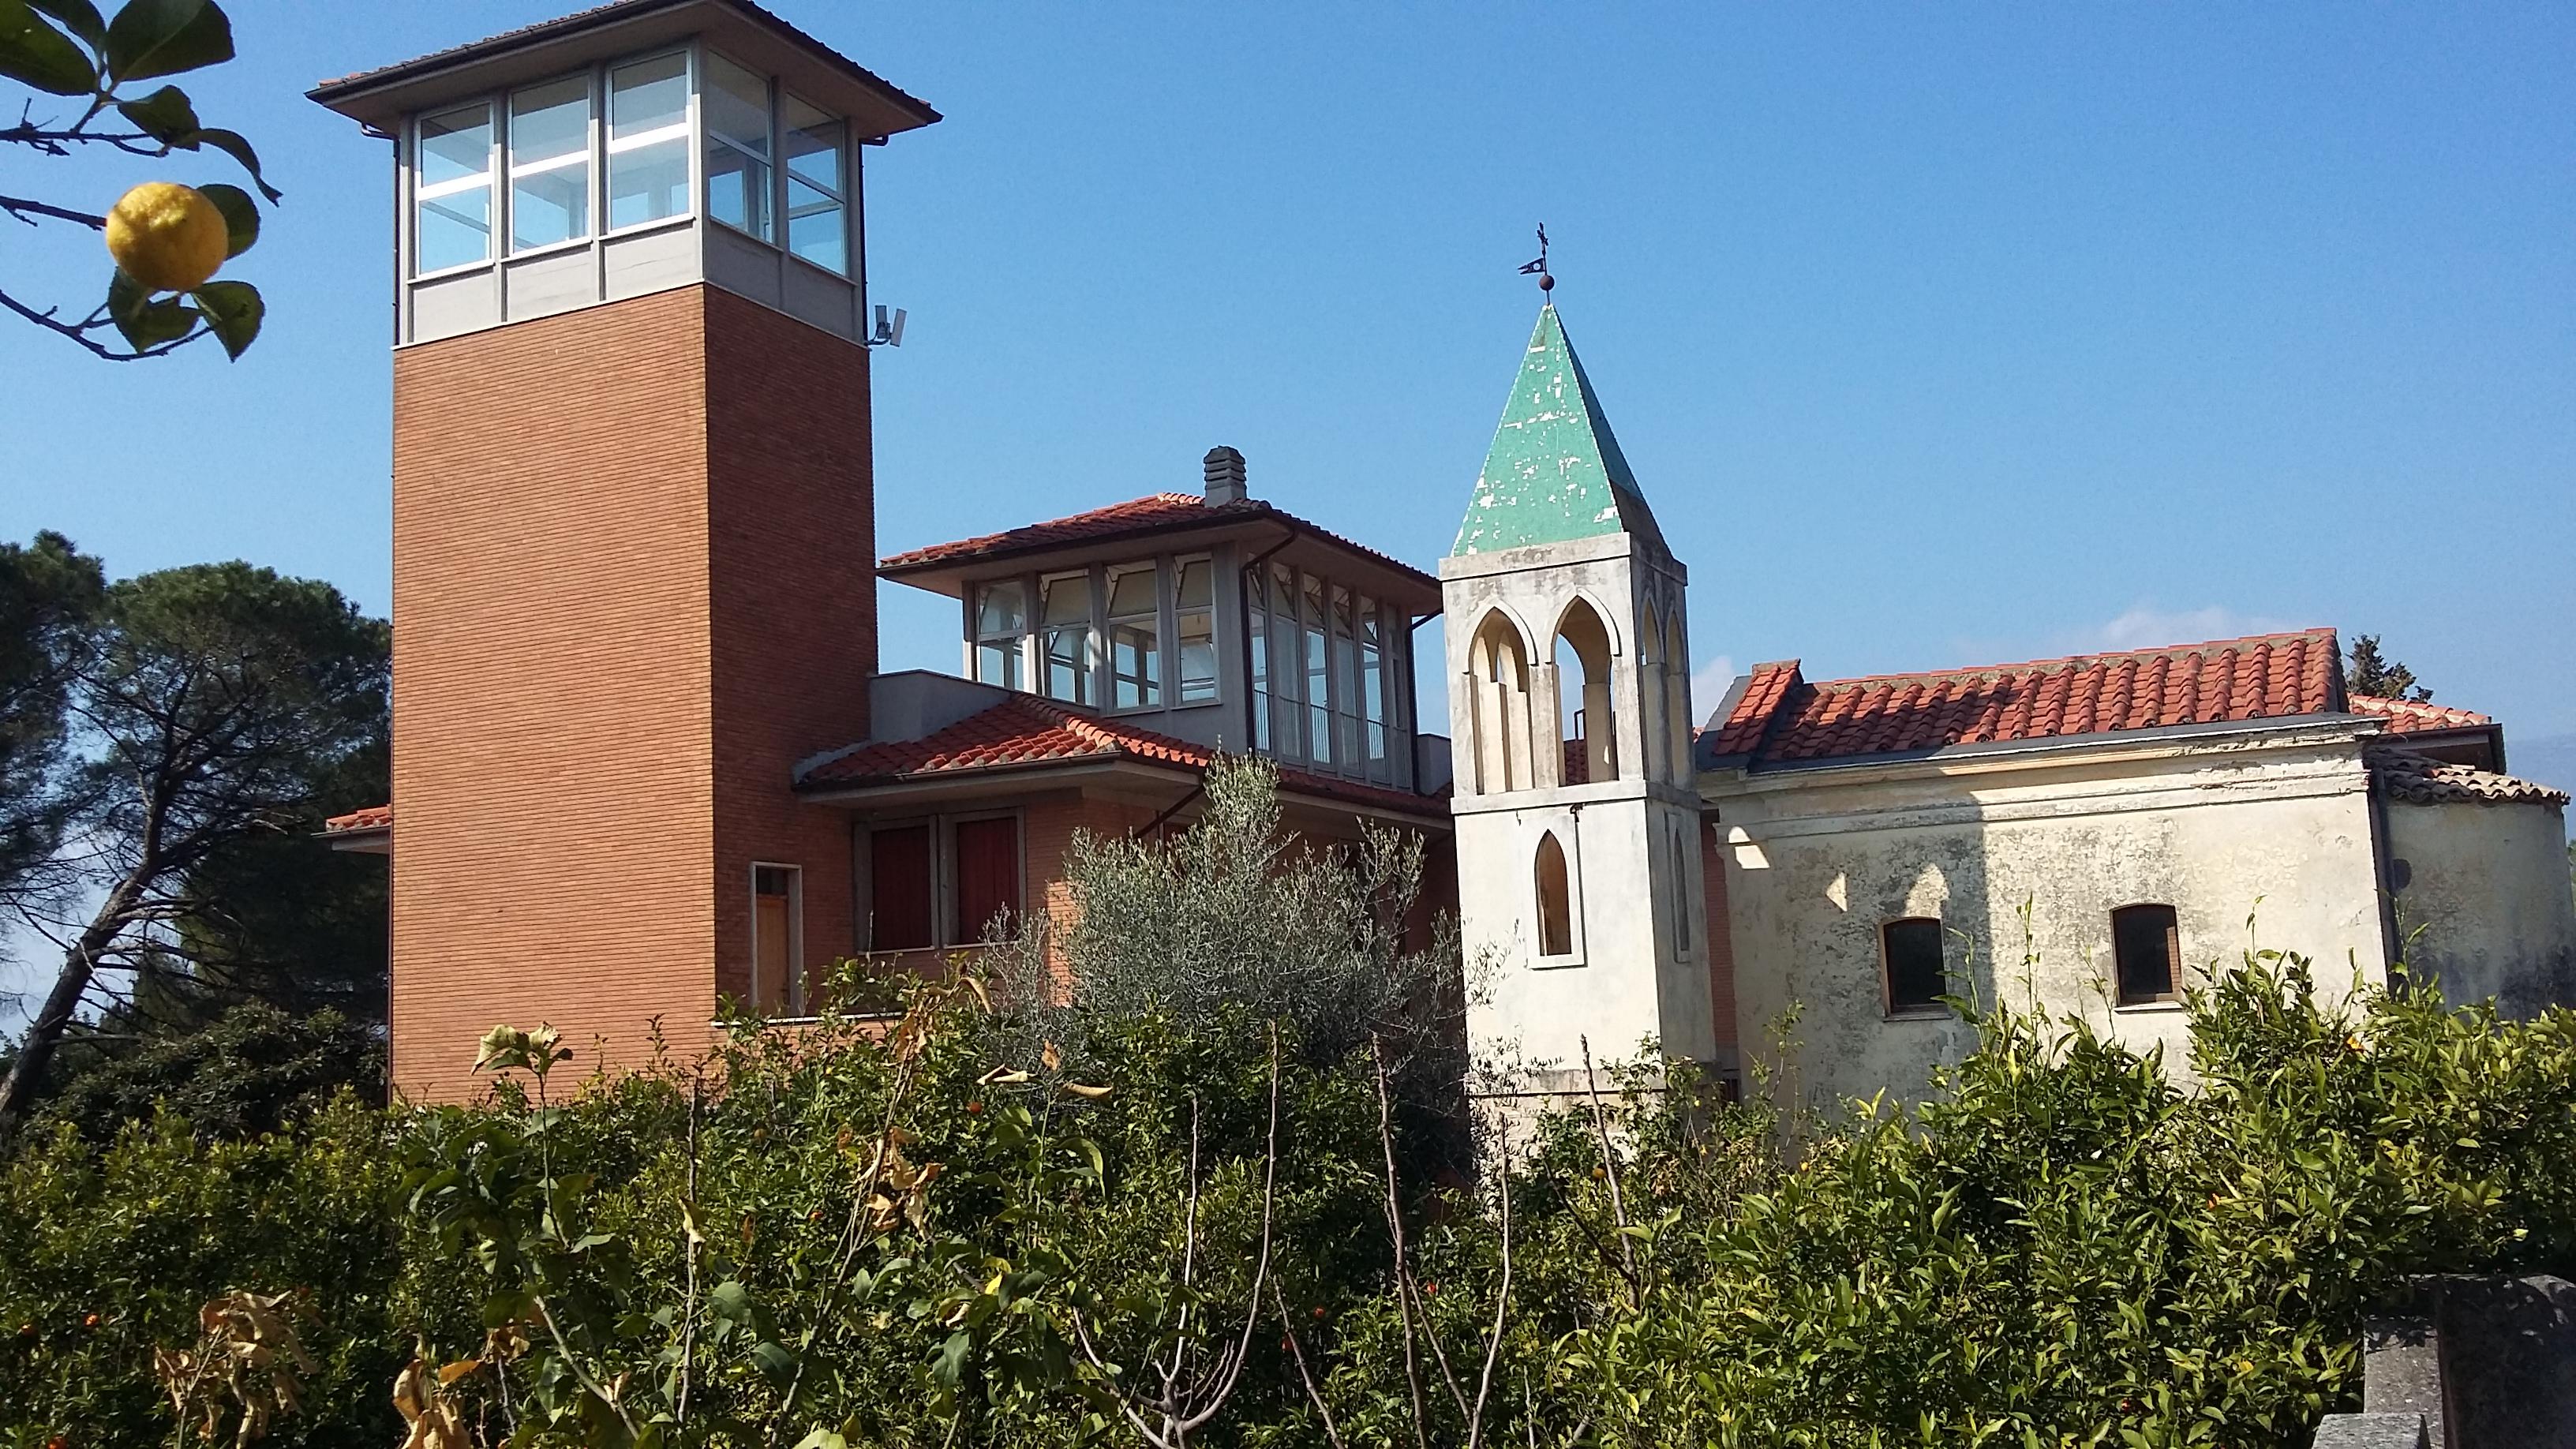 Villa Placitelli